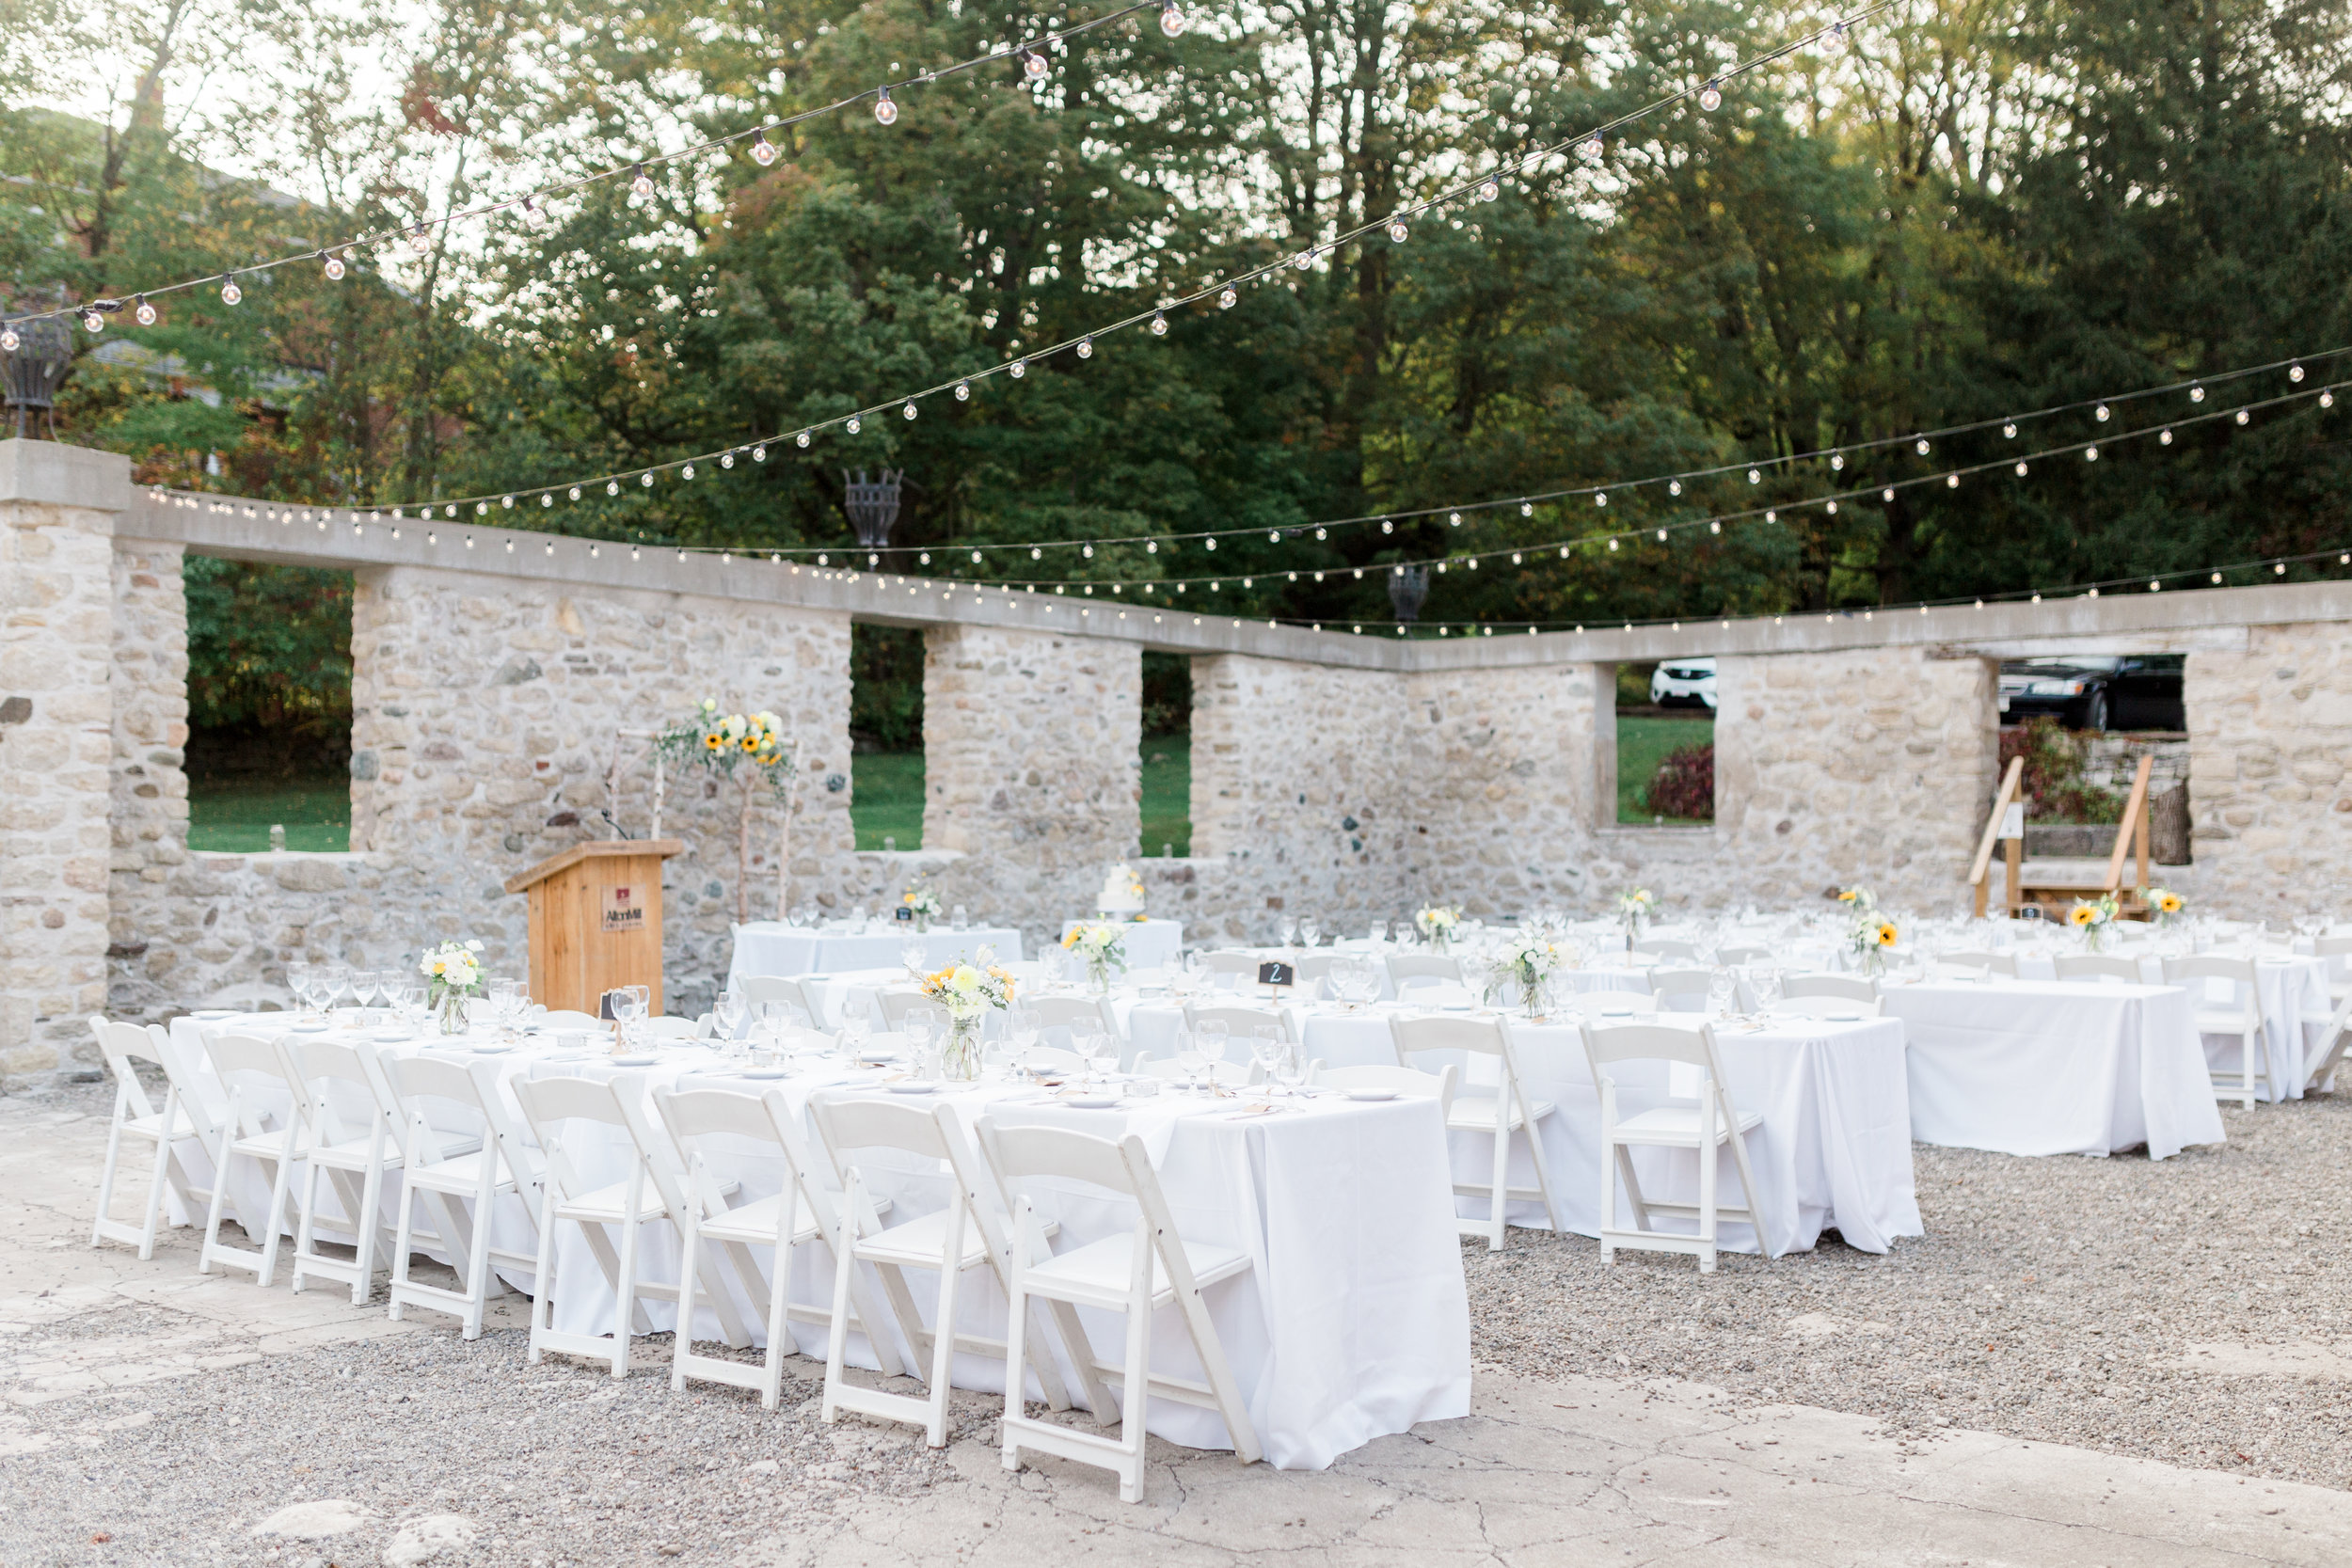 Alton Mills Wedding - Reception-5.jpg